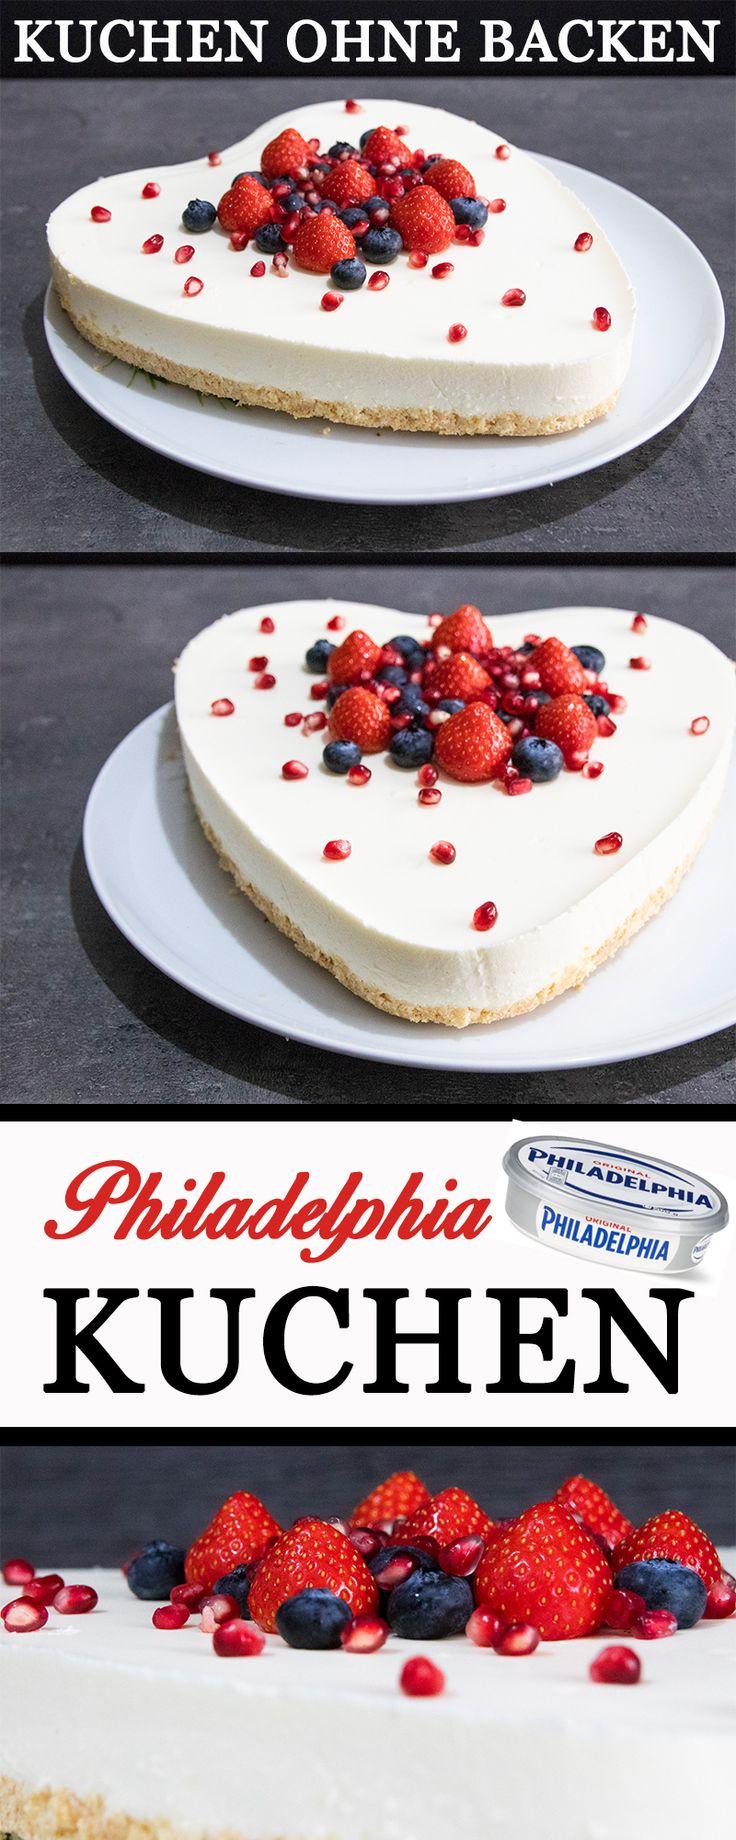 Philadelphia Kuchen OHNE BACKEN